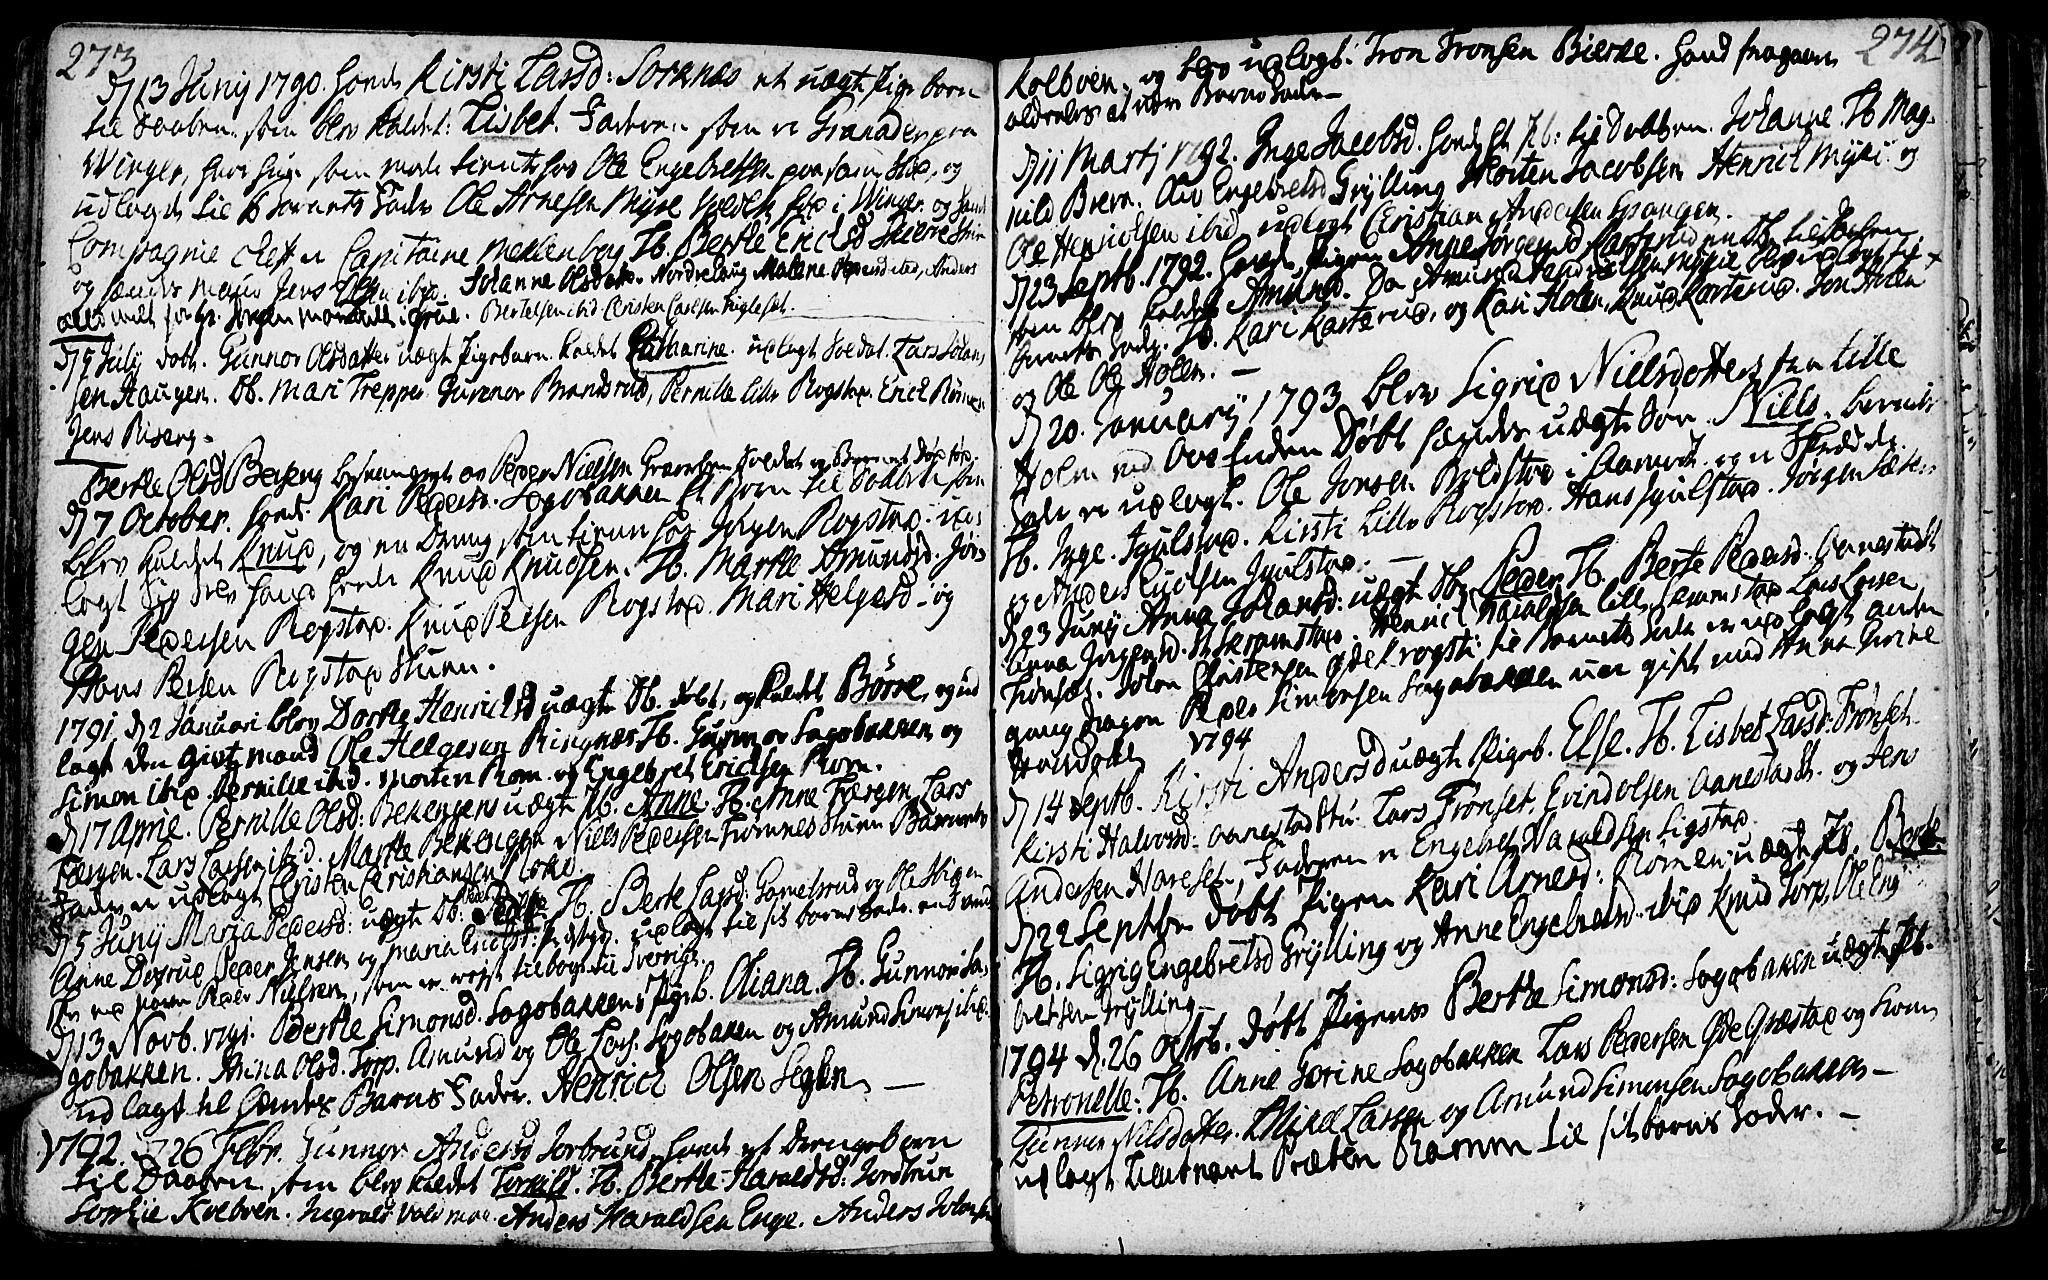 SAH, Løten prestekontor, K/Ka/L0003: Ministerialbok nr. 3, 1773-1800, s. 273-274